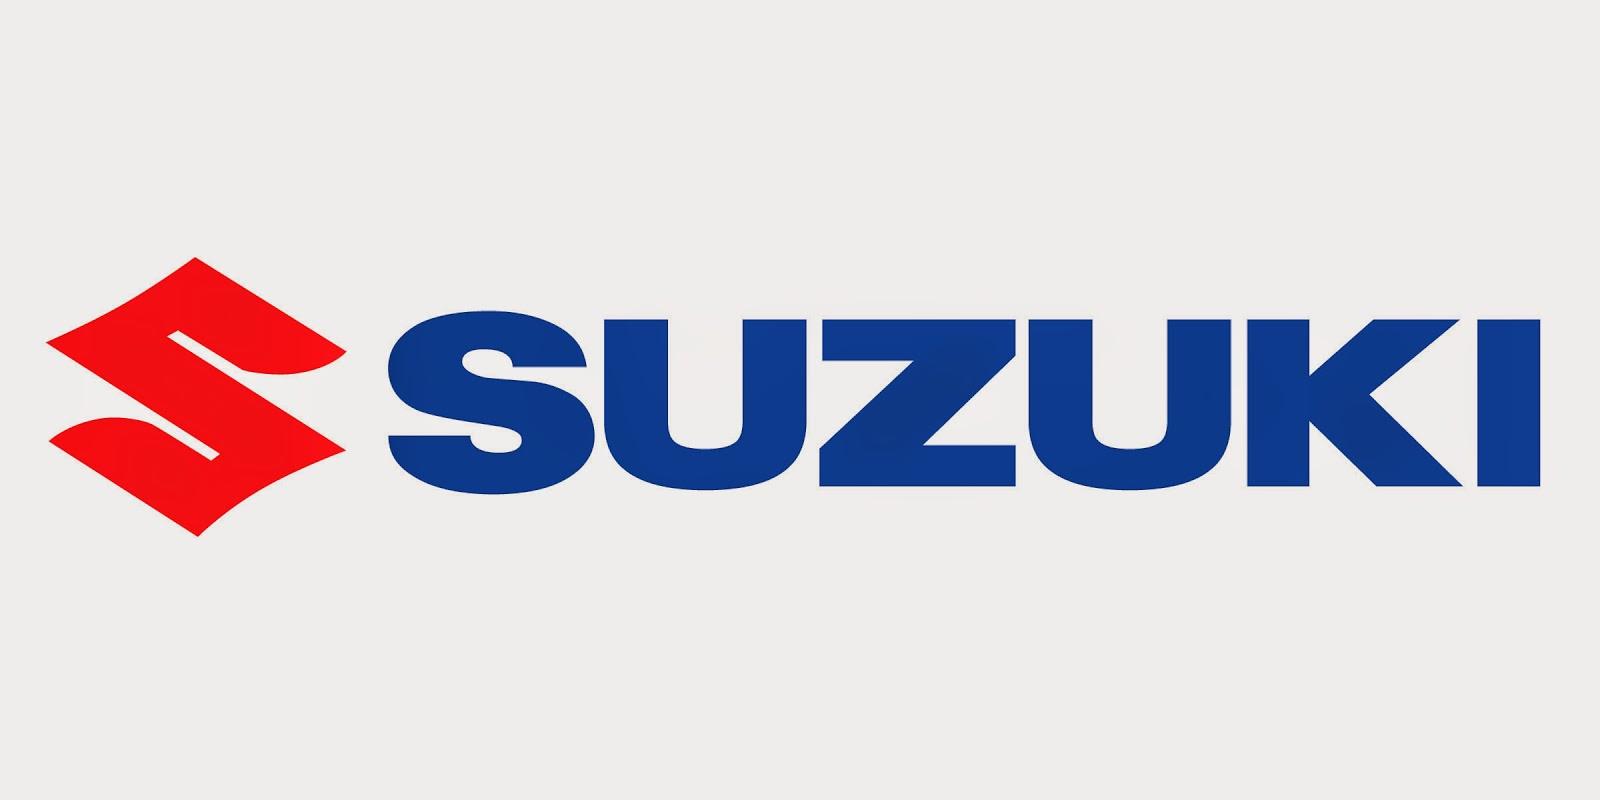 Suzuki logo wallpapers HD